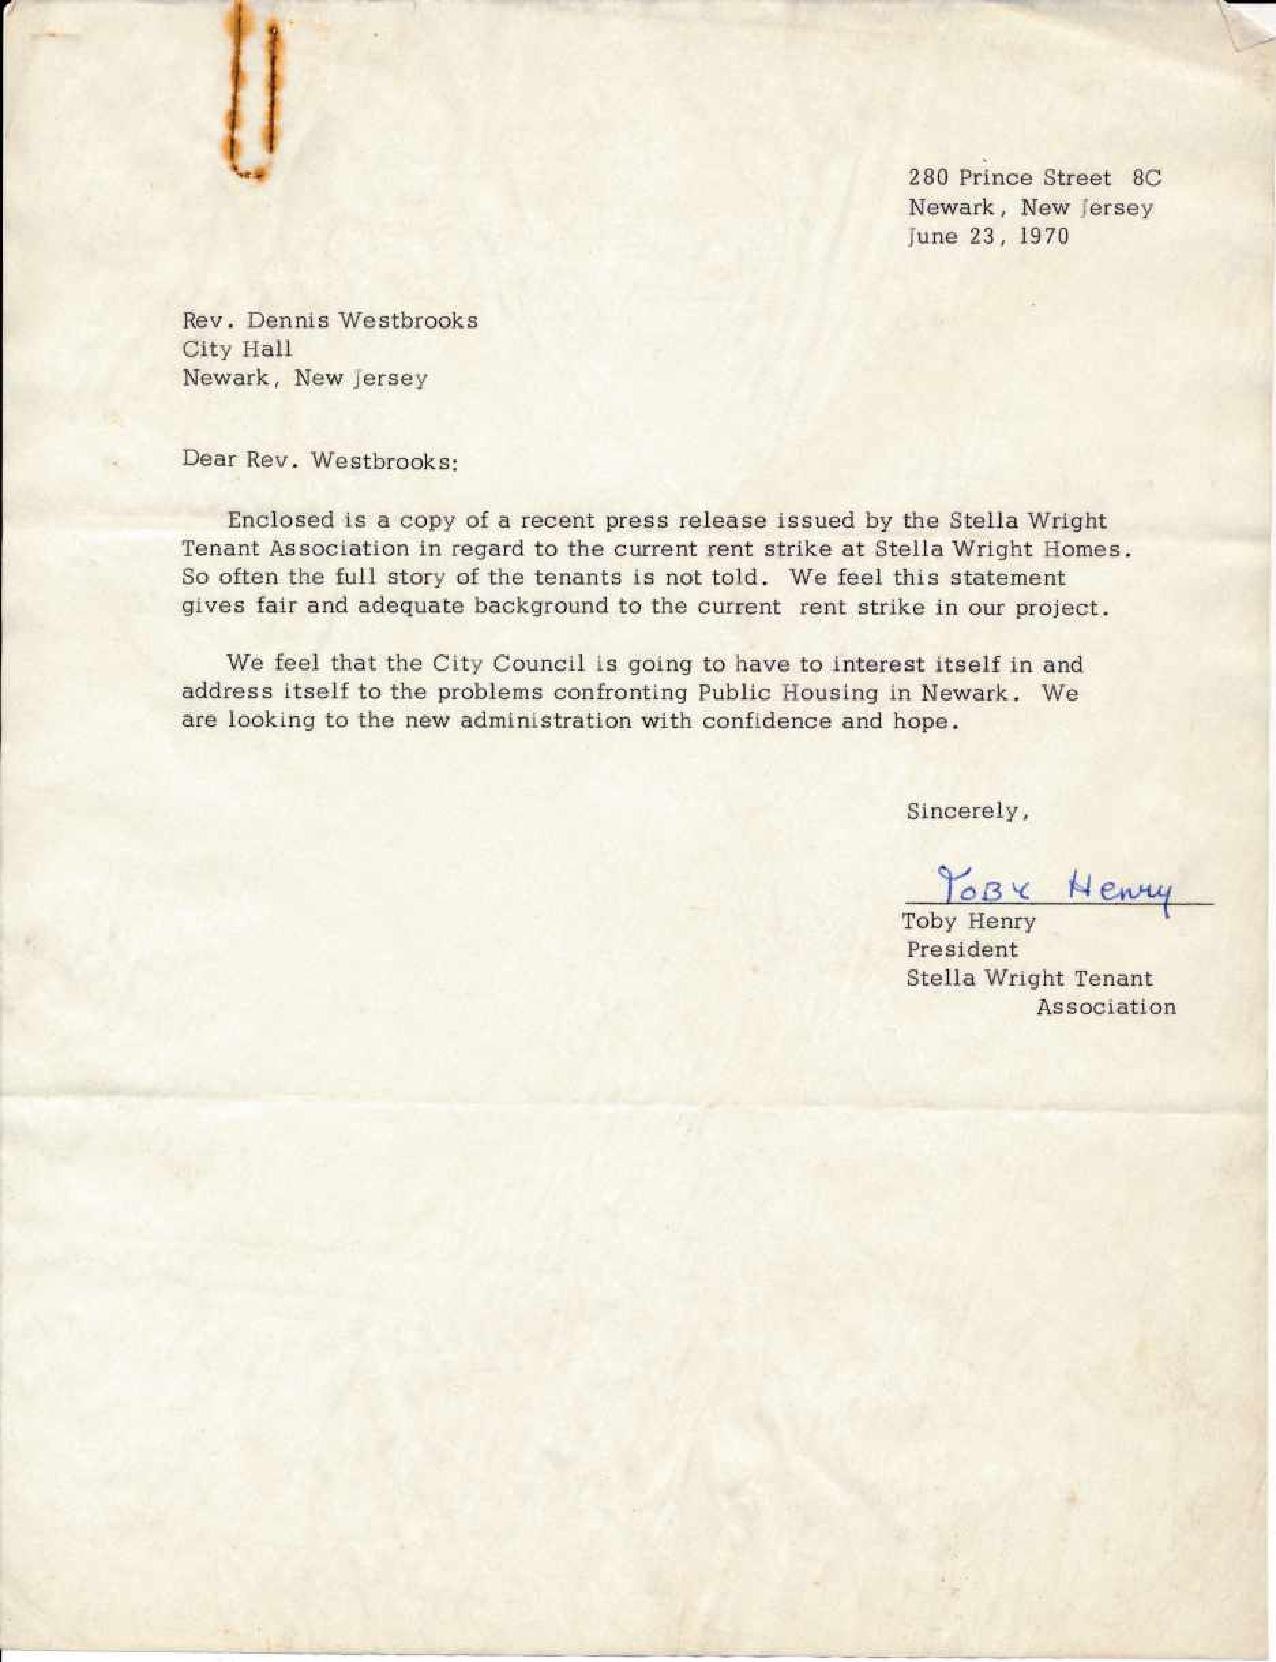 Stella Wright Tenant Association Press Release (1970)